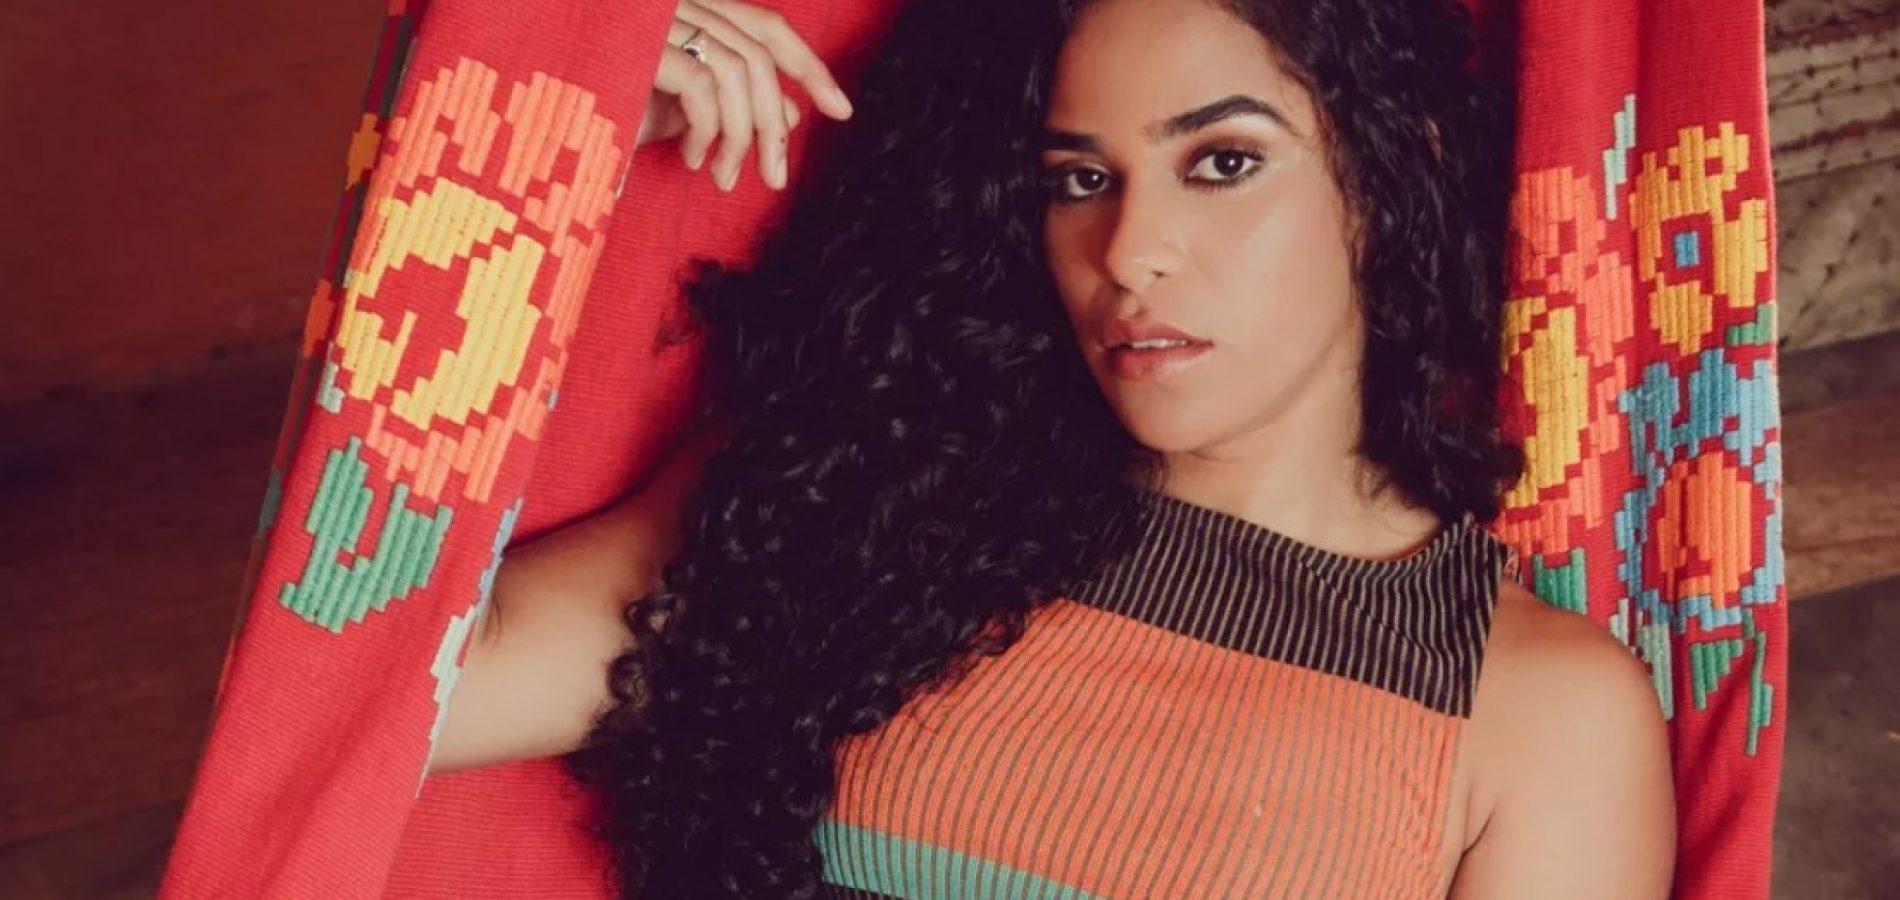 Com sanfona no ombro, Elana Valenária defende e exalta as belezas do Nordeste